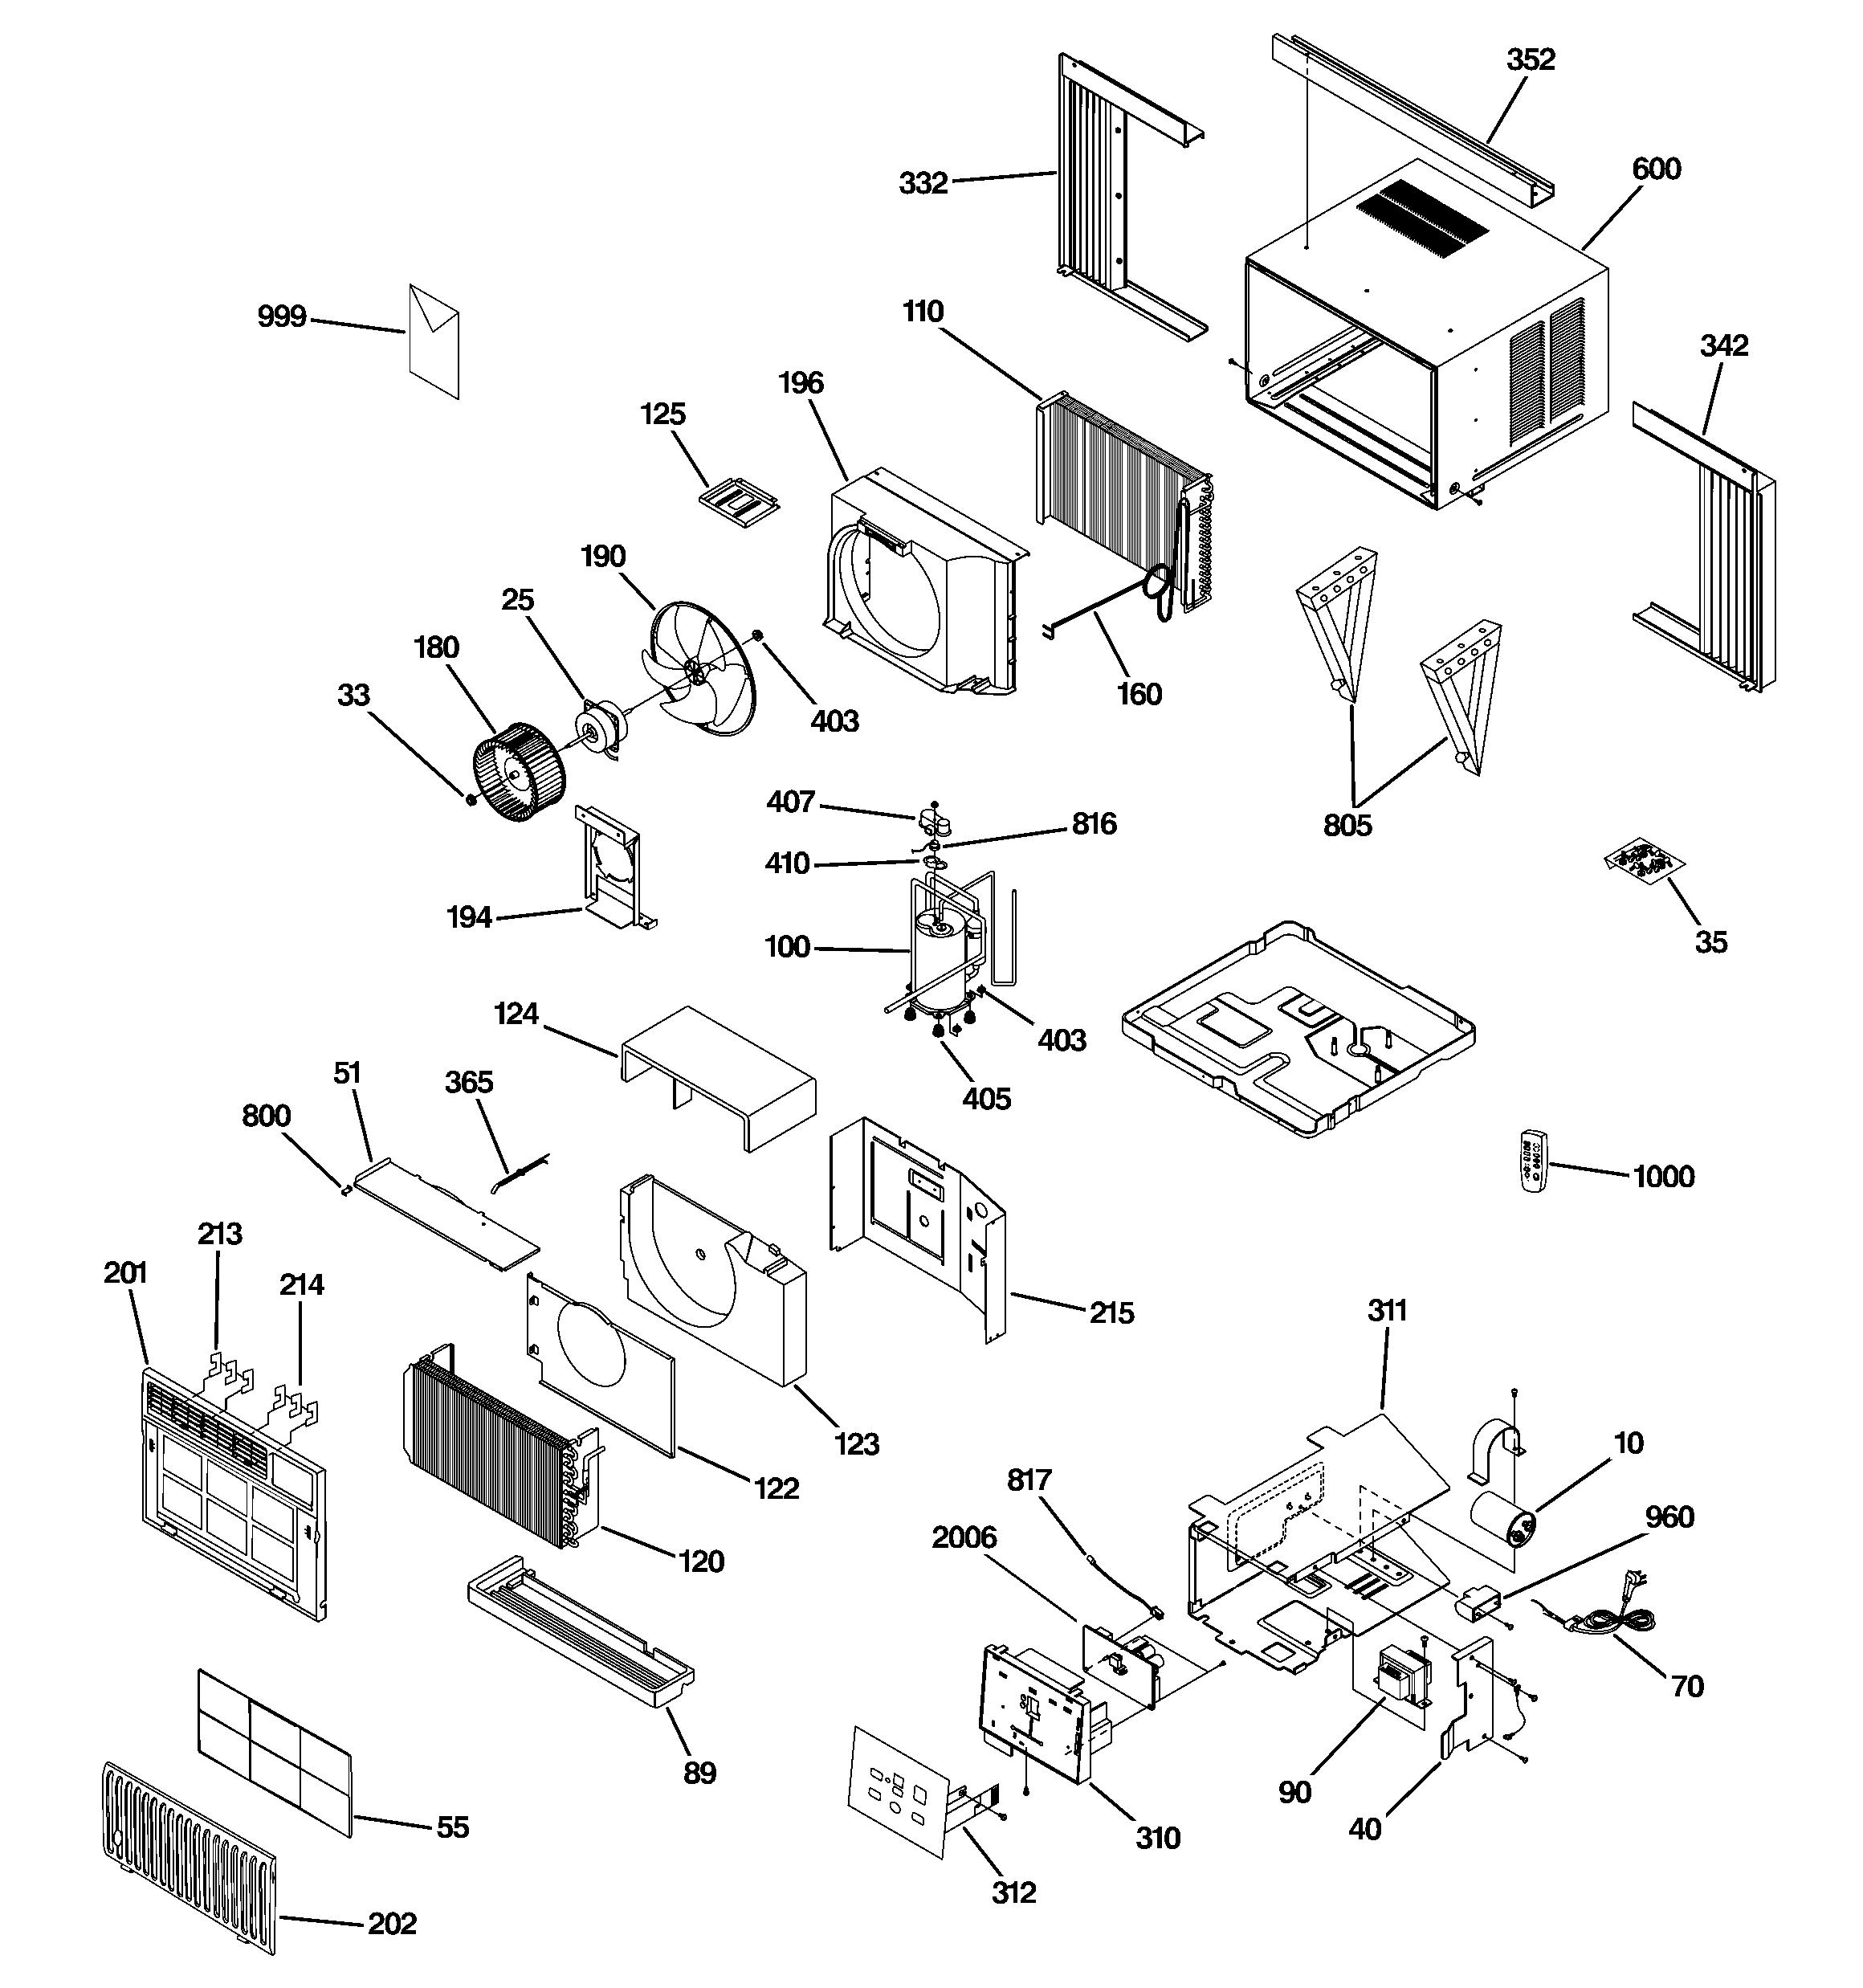 Hardy H2 Wood Furnace Wiring Diagram on